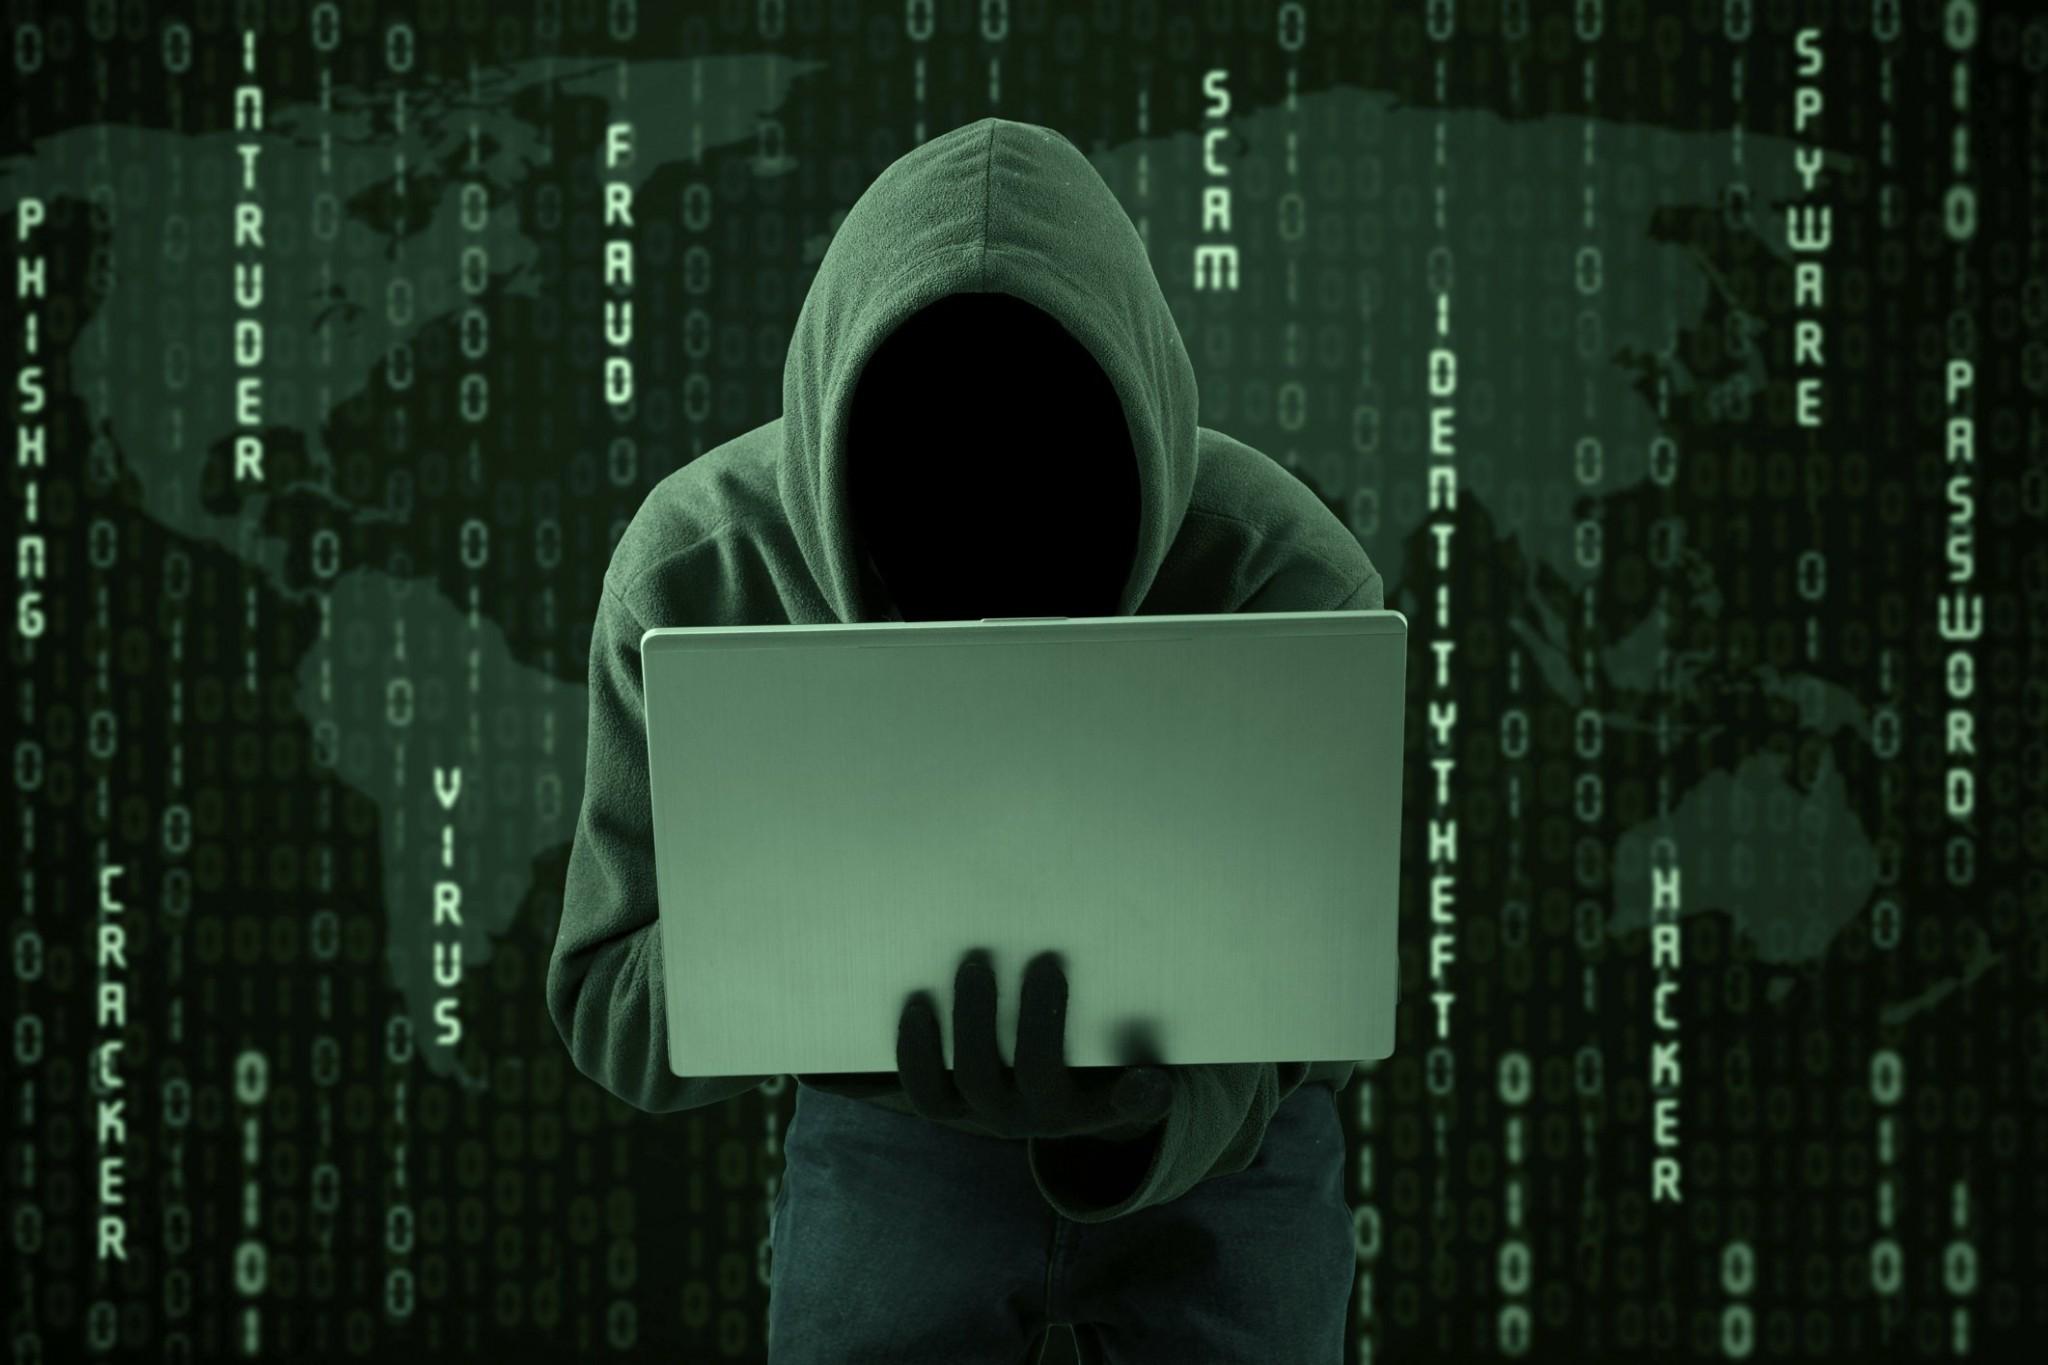 Аккаунт онлайн-кинотеатра Netflix в Твиттер взломан хакерами